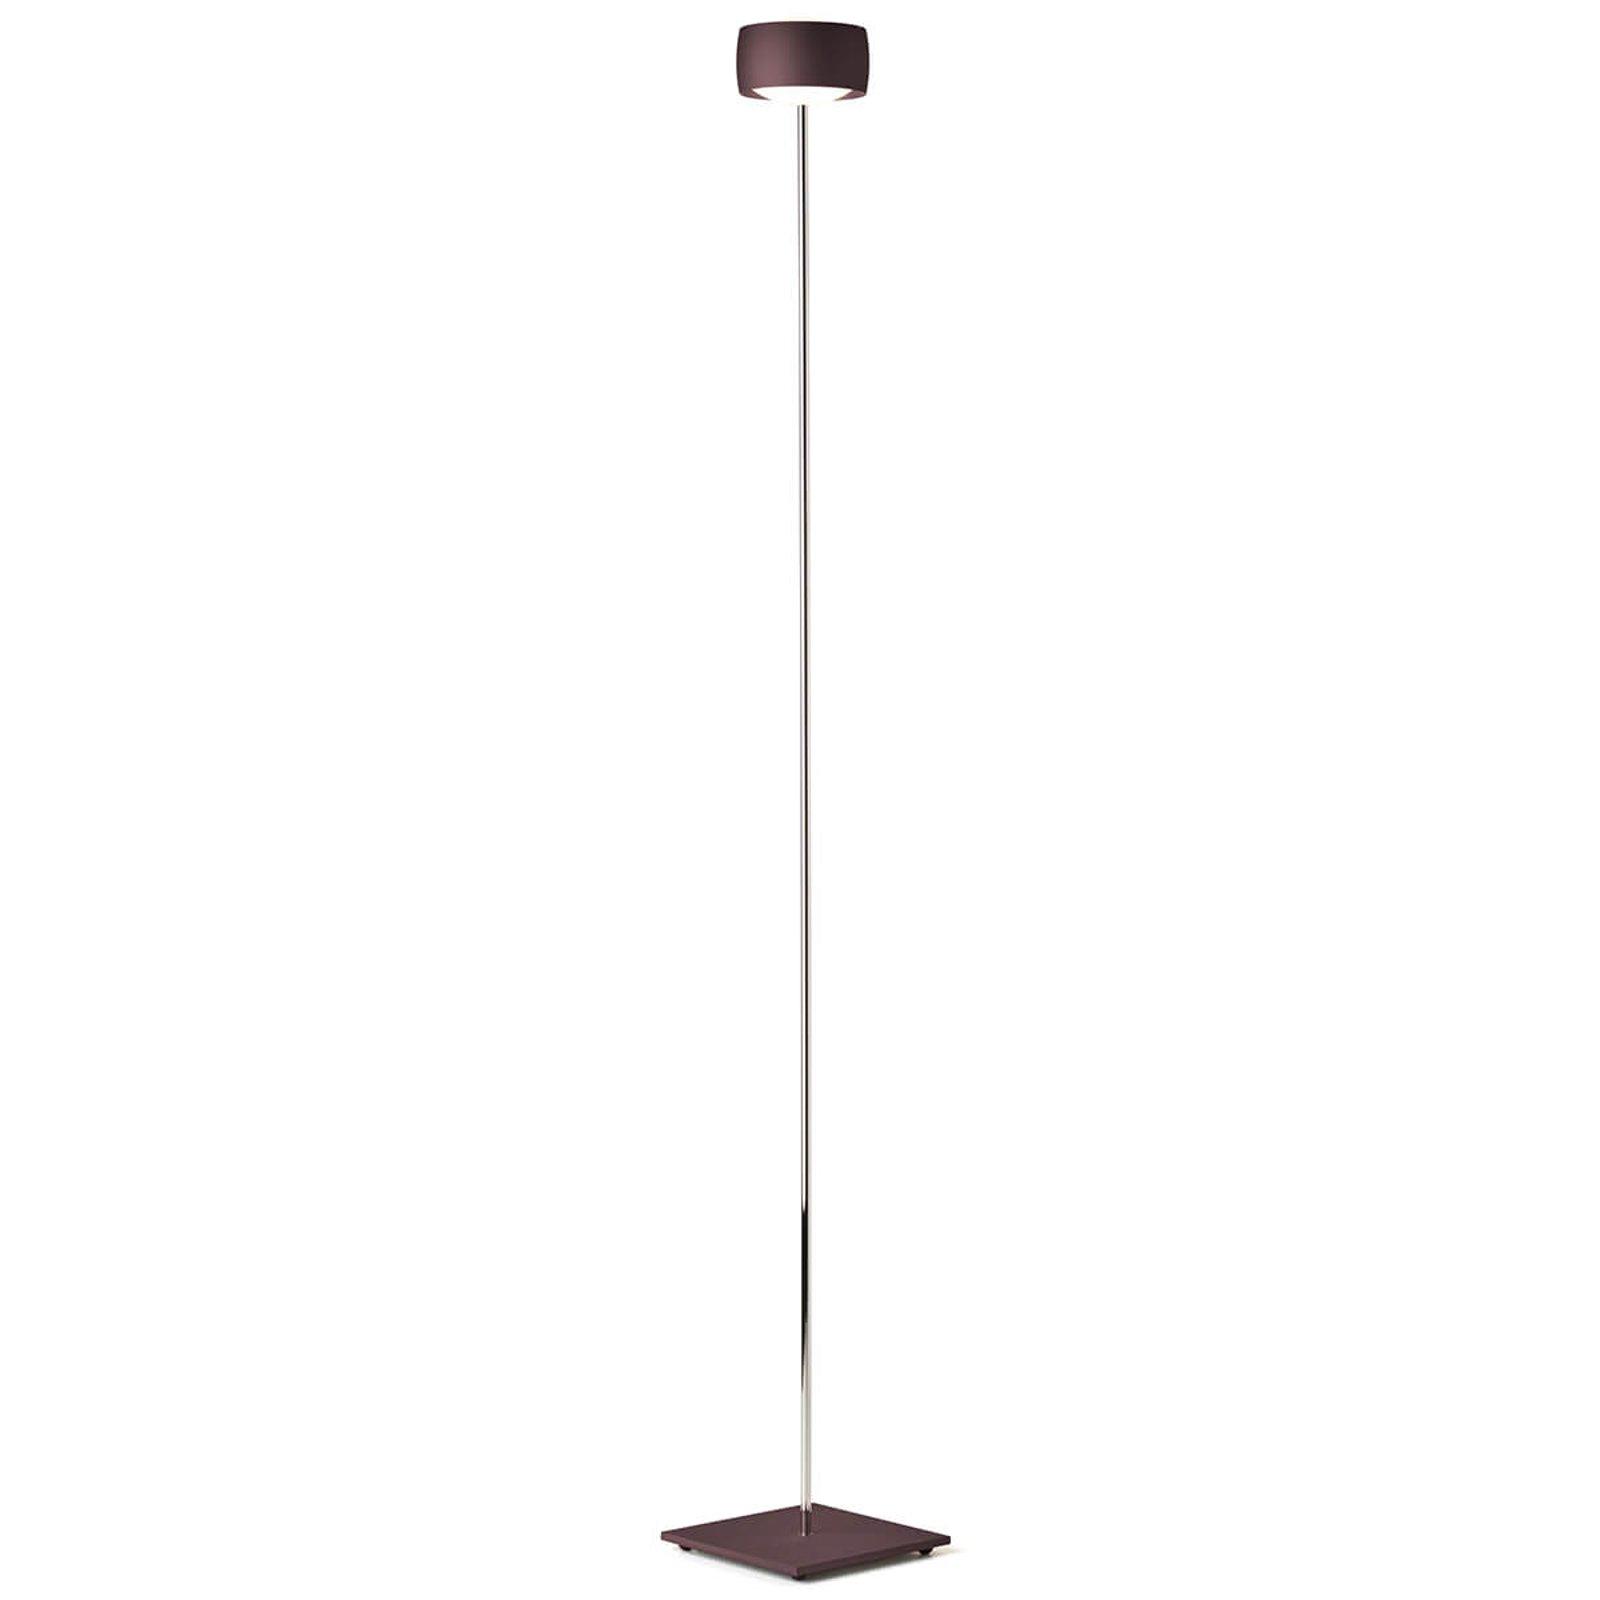 LED-gulvlampe Grace med bevegelsesstyring espresso